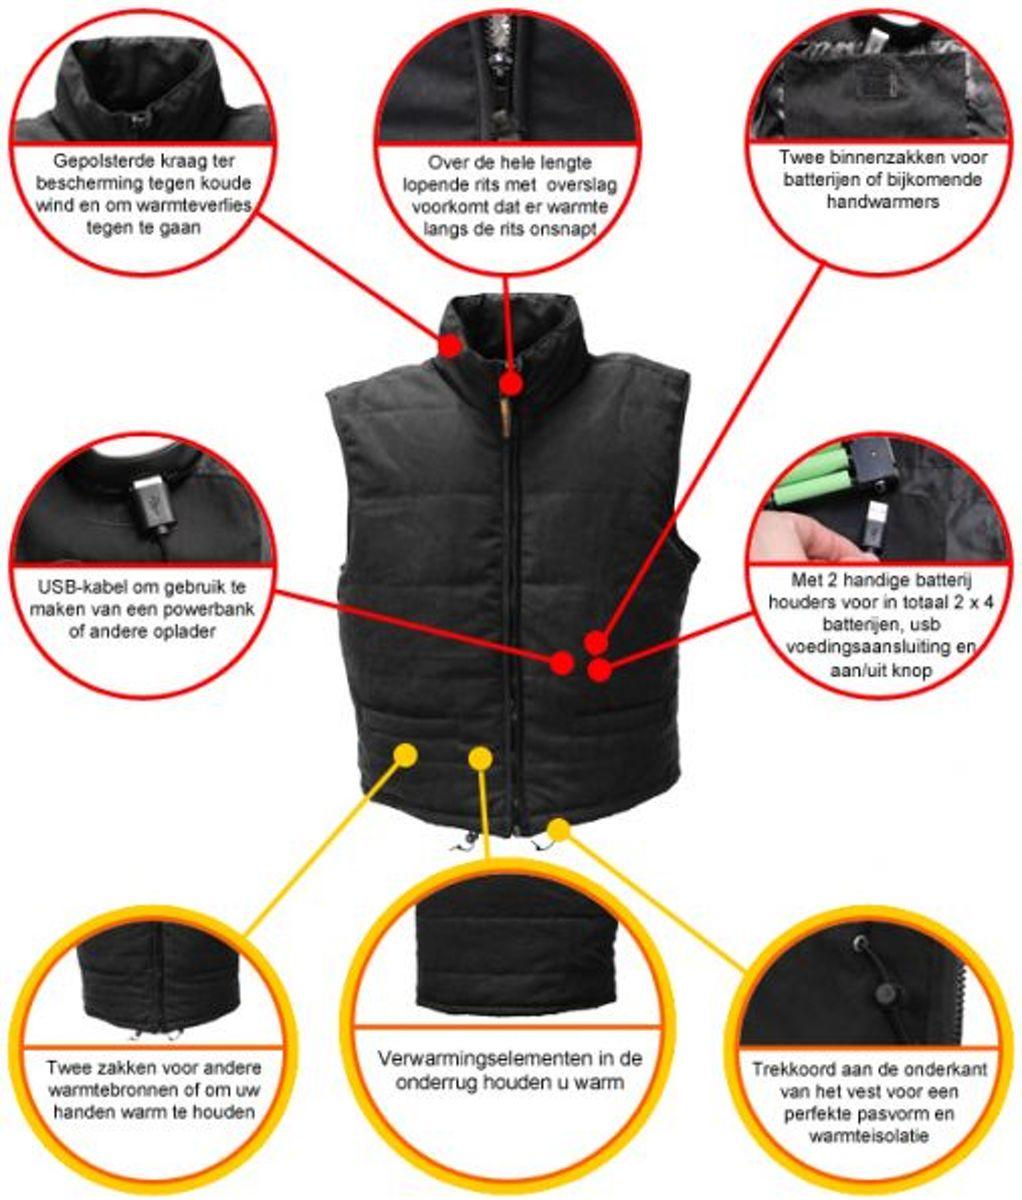 808315158c1 bol.com | Warmawear™ Verwarmd Vest met Kraag voor Haar- L -Verwarmde jas